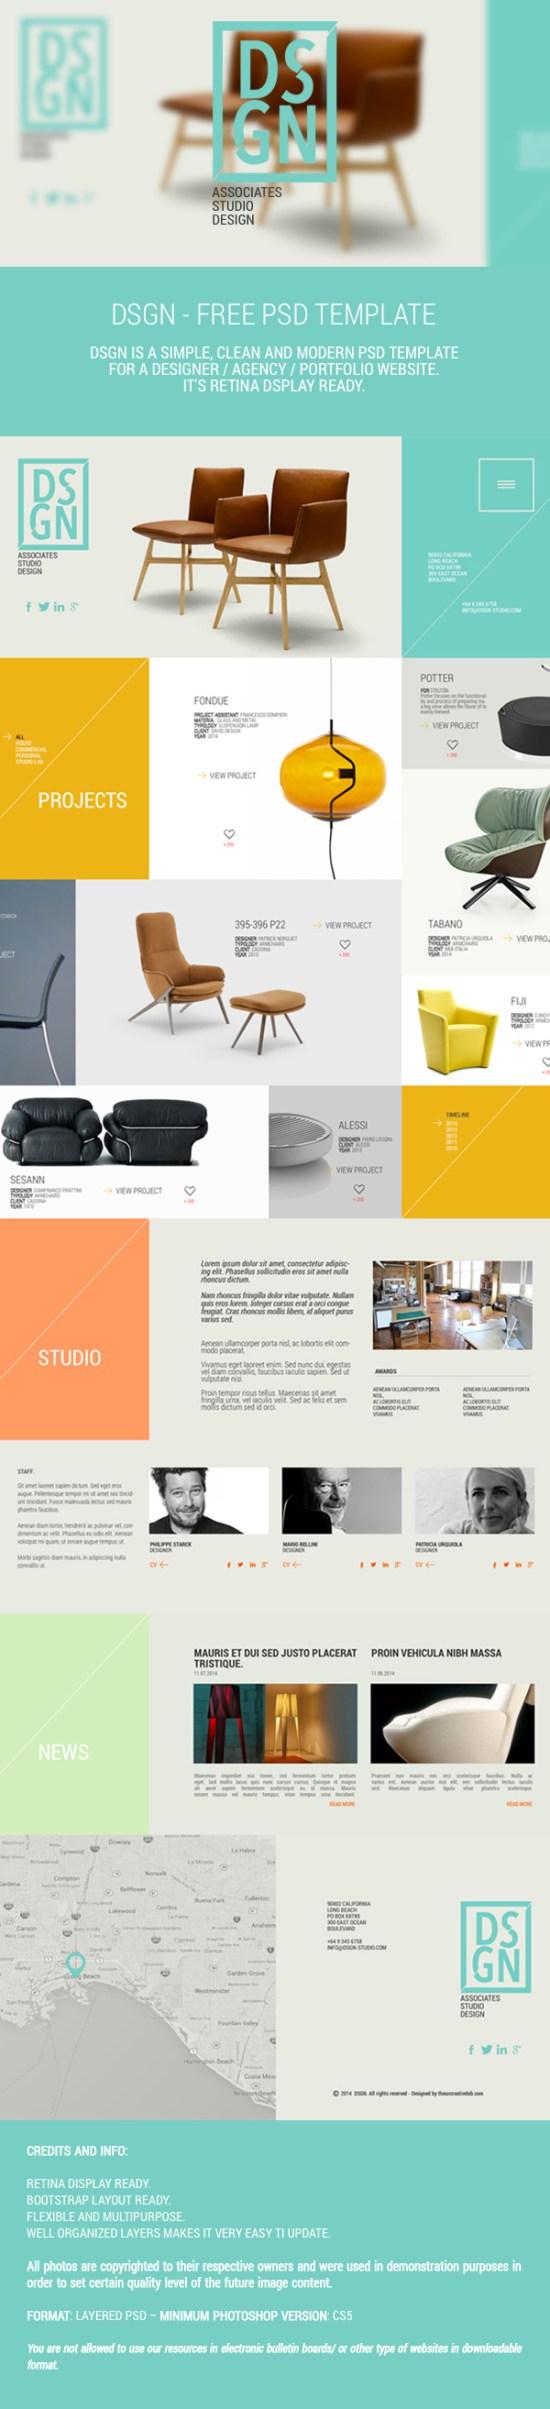 Free PSD Website Theme Template